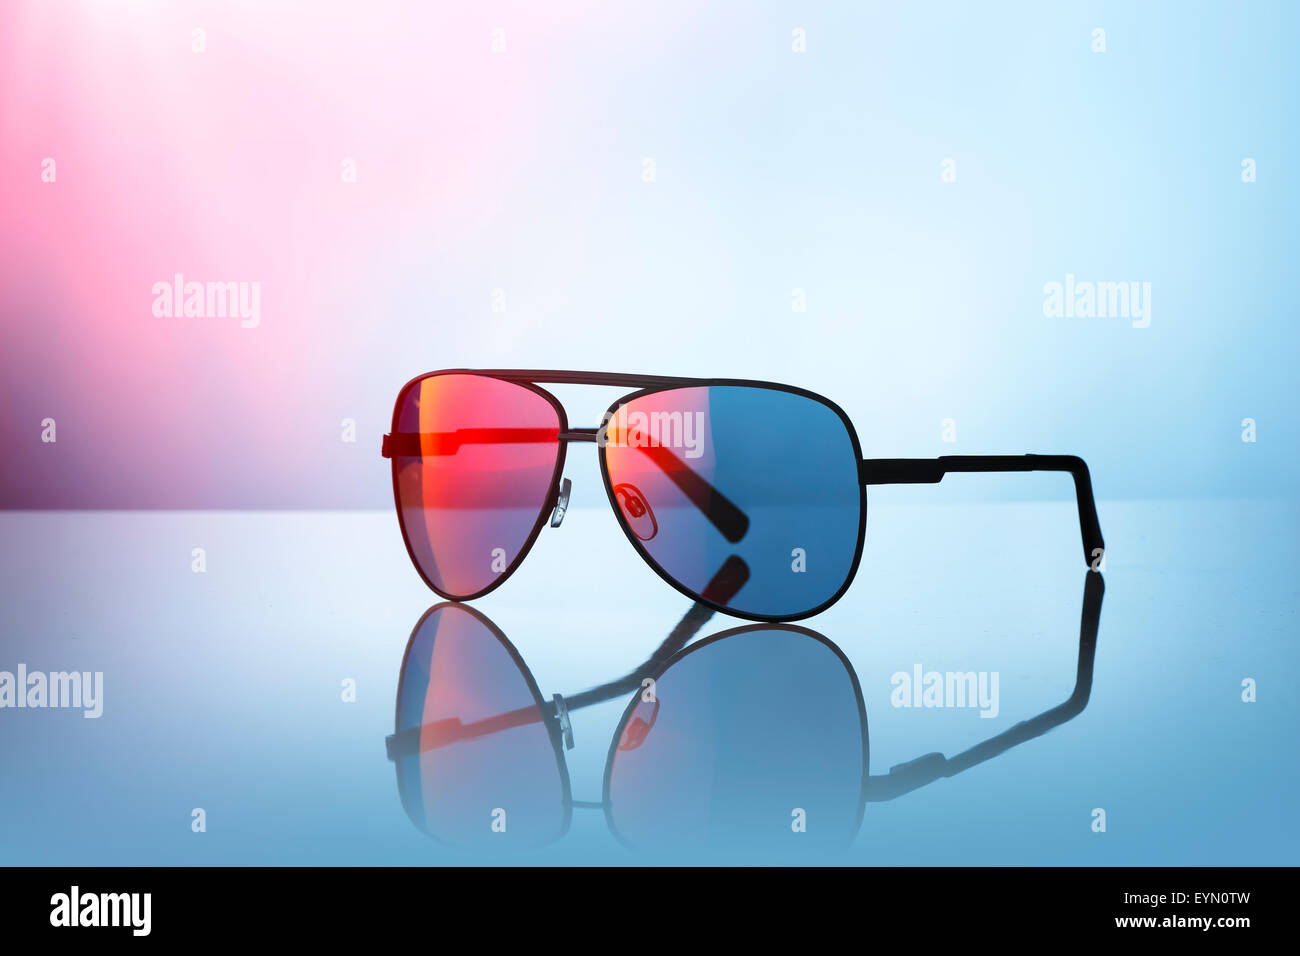 Sunglasses on reflective surface. - Stock Image